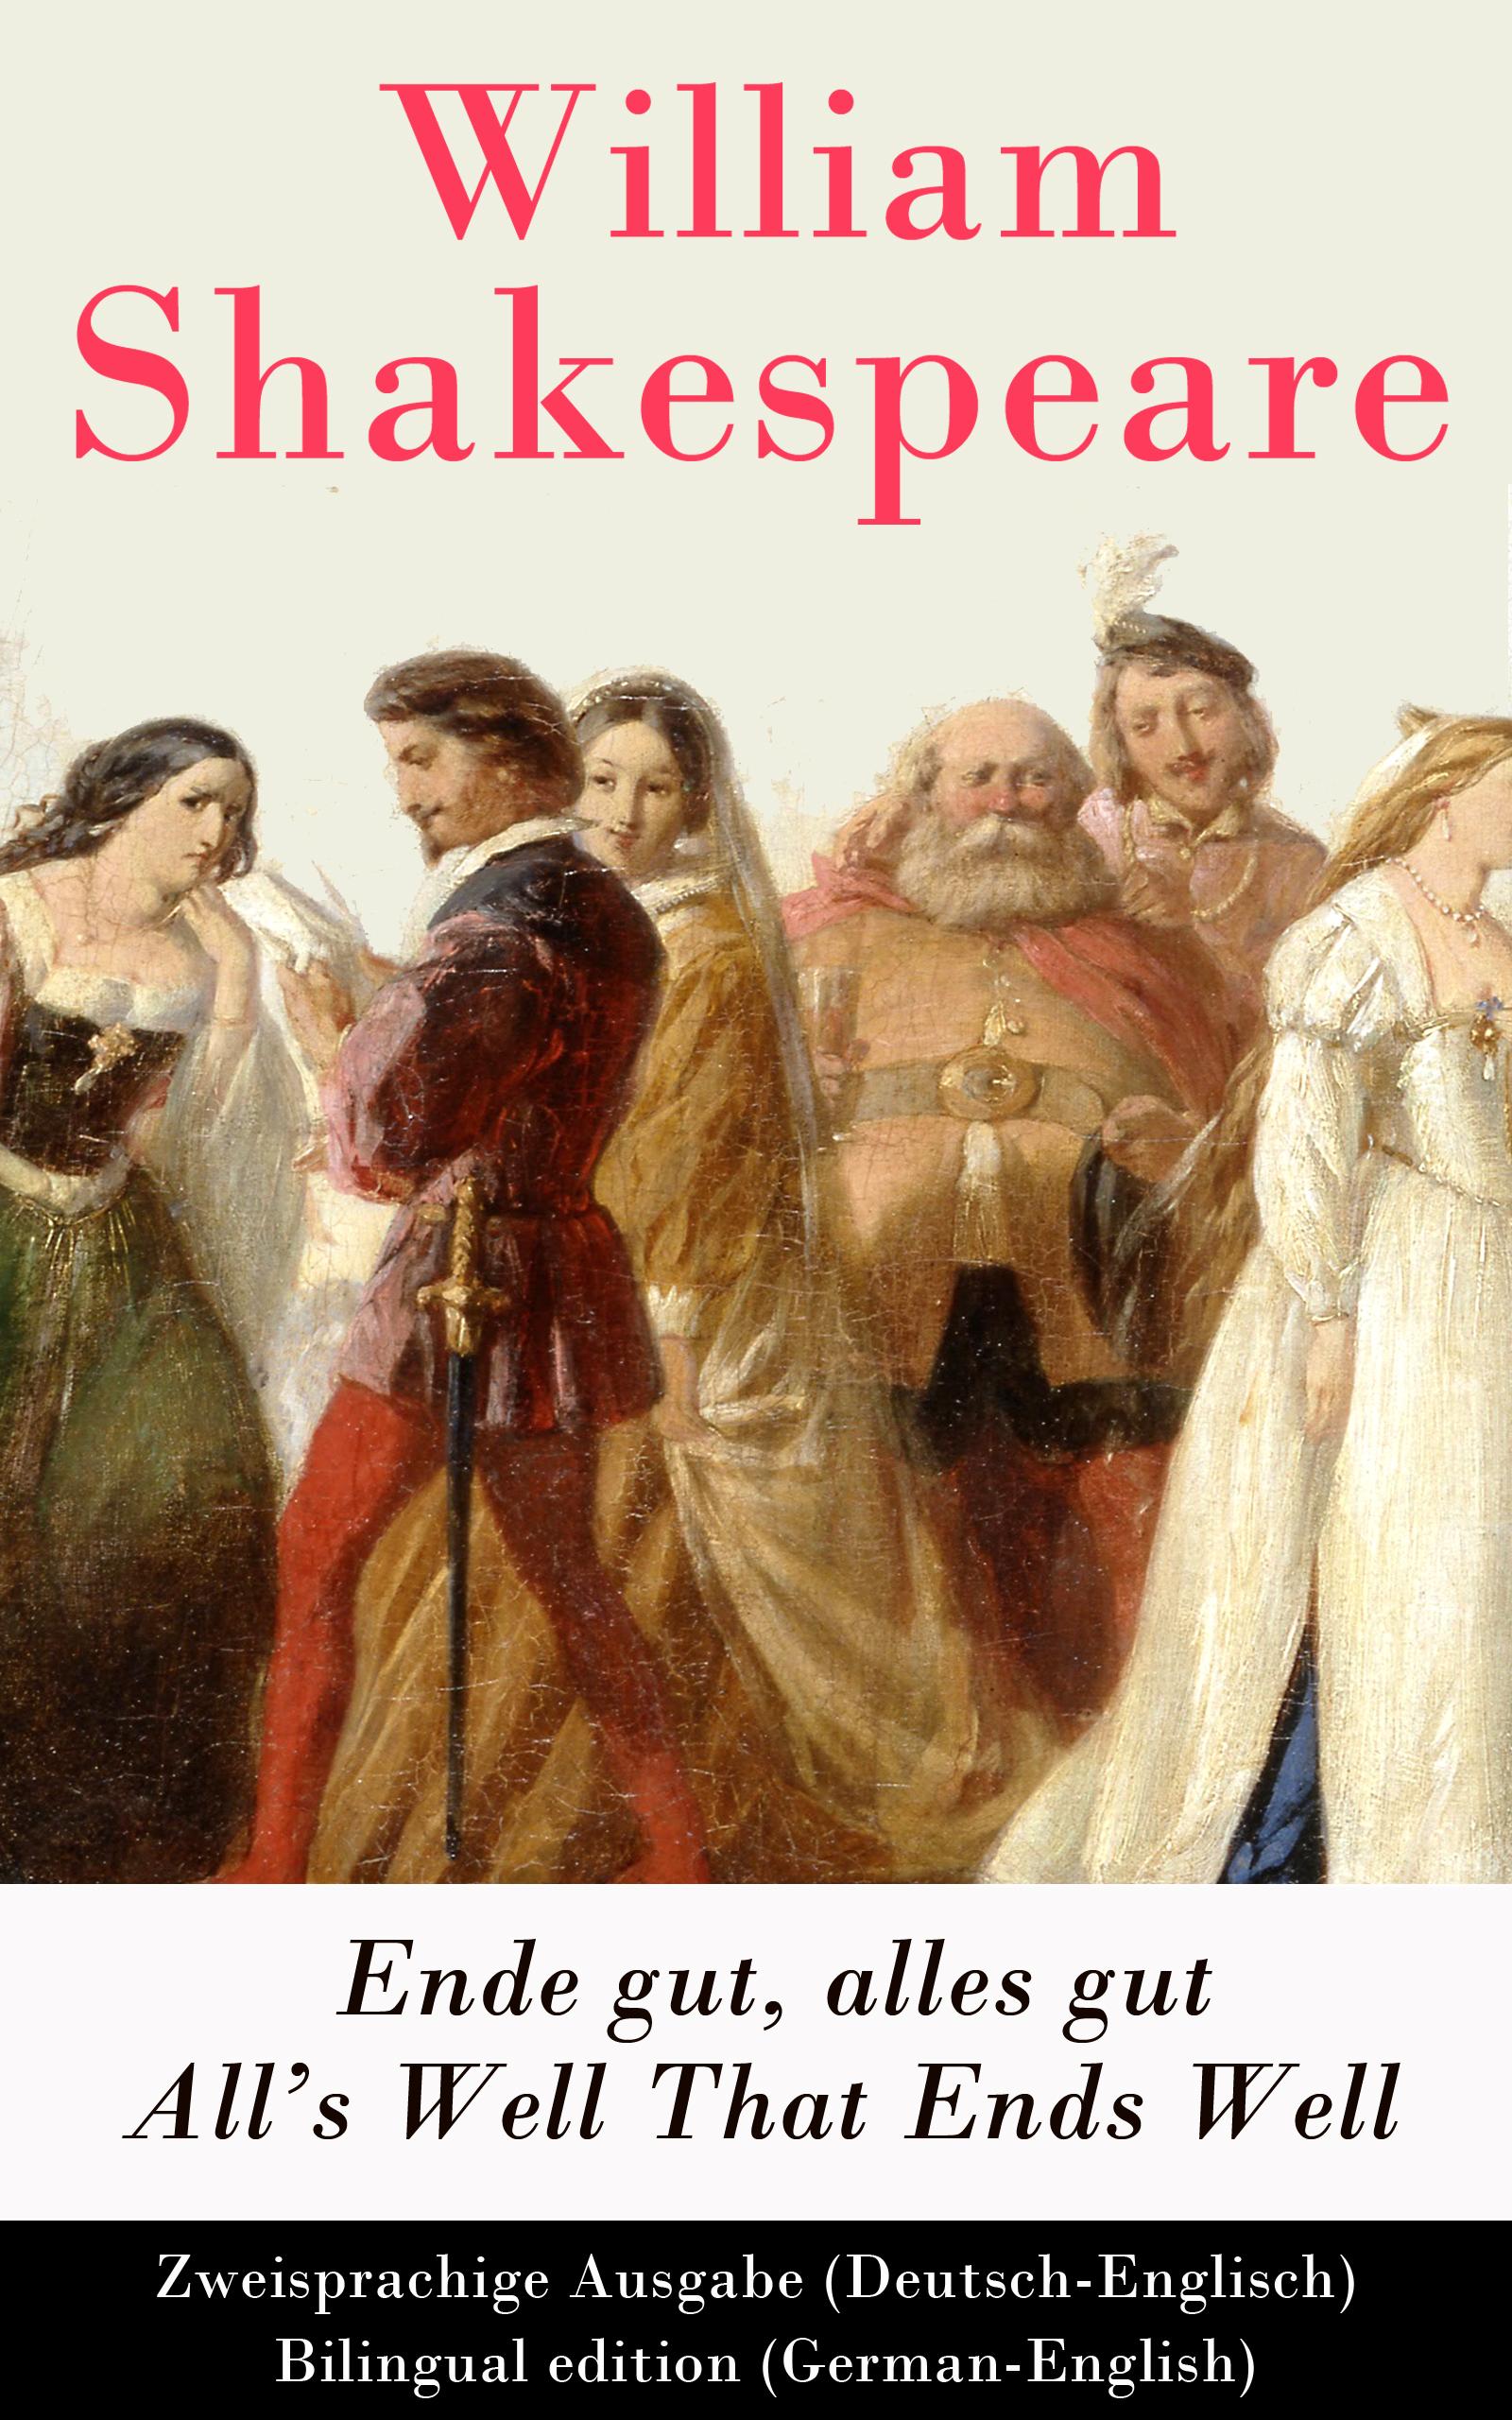 Уильям Шекспир Ende gut, alles gut / All's Well That Ends Well (Deutsch-Englisch) / Bilingual edition (German-English) полусапоги gut gut mp002xw19pzd